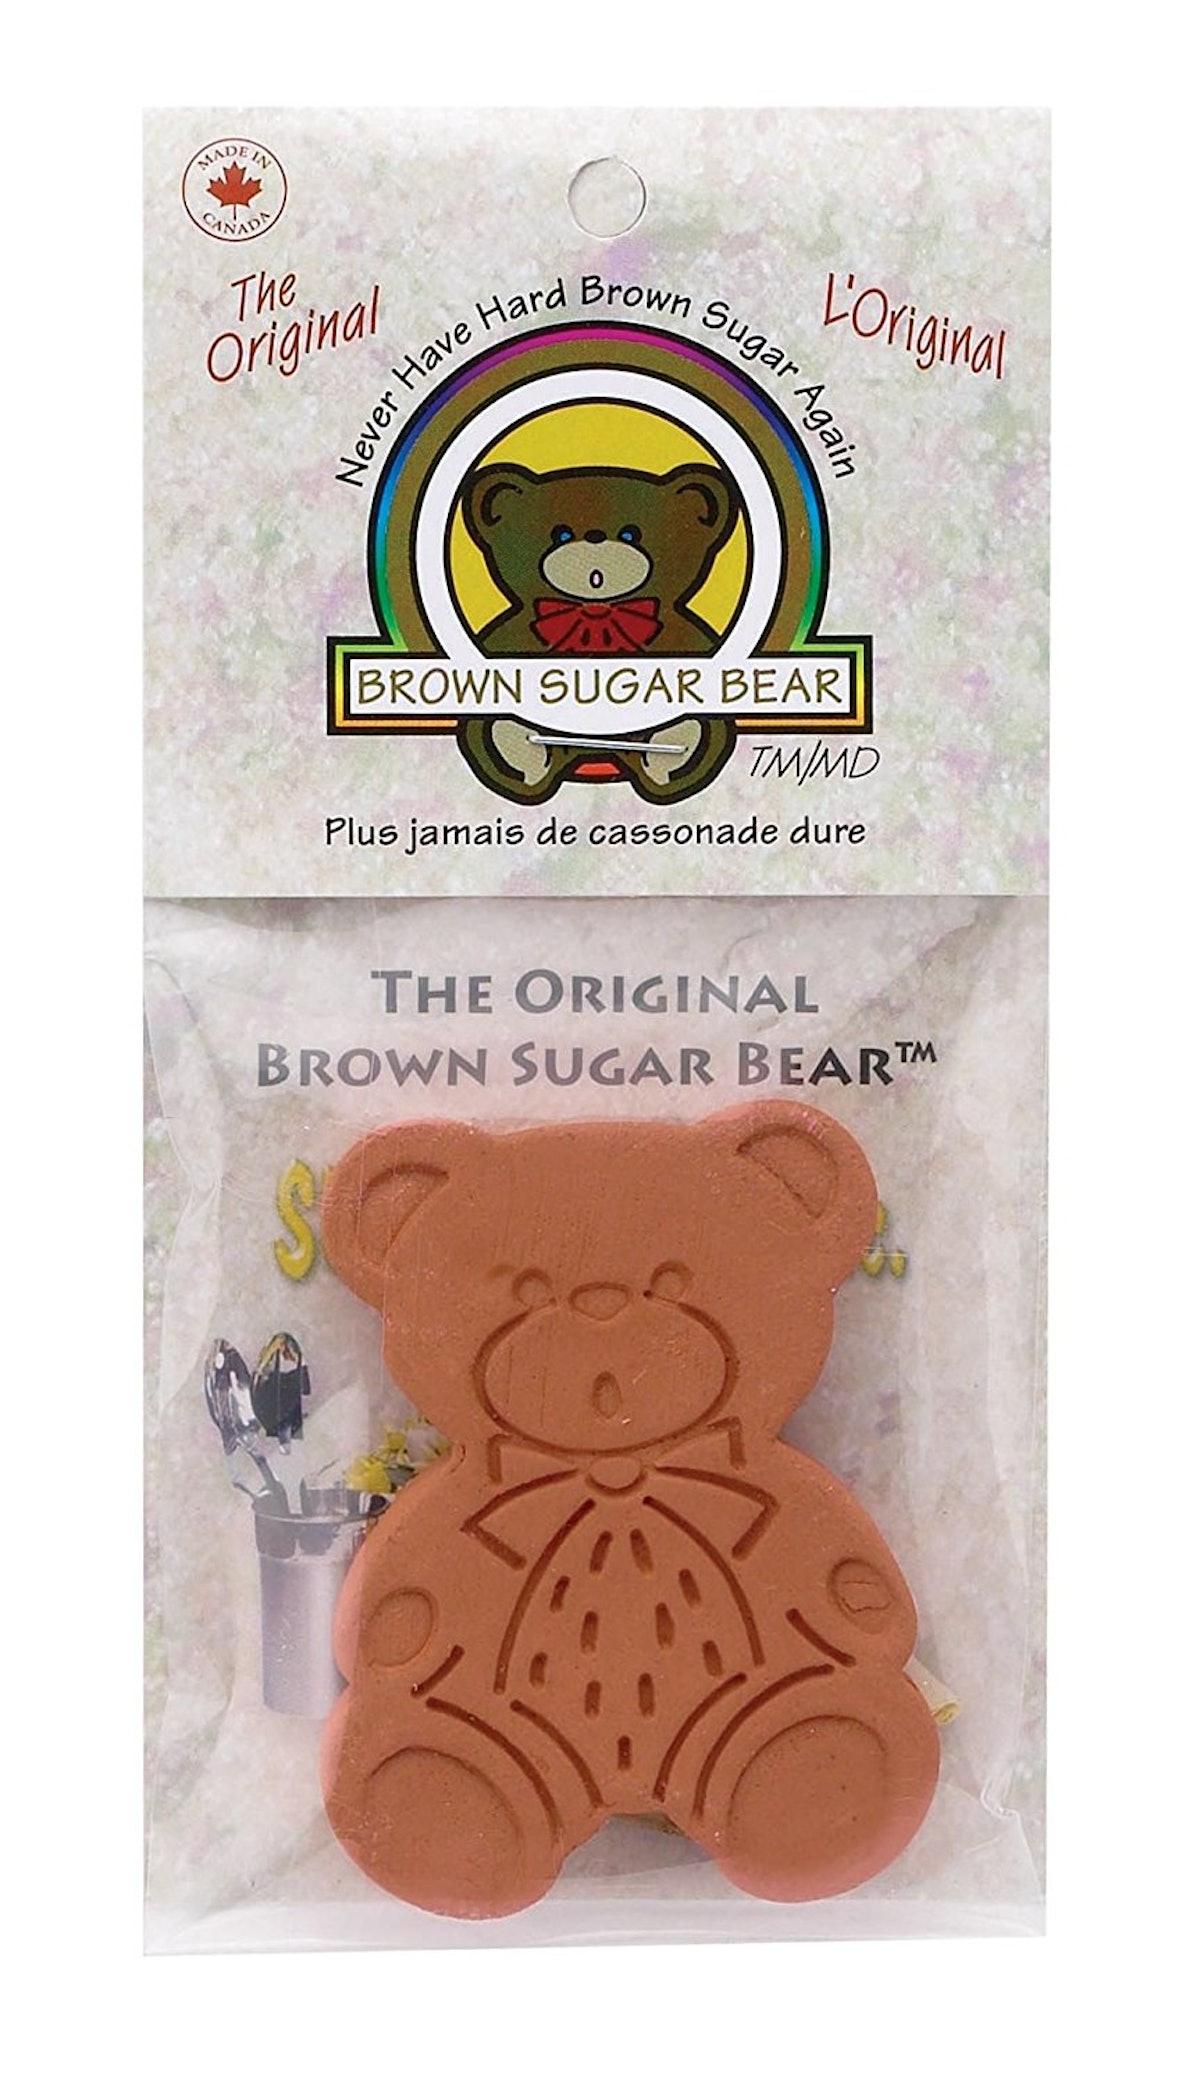 Brown Sugar Bear Brown Sugar Saver